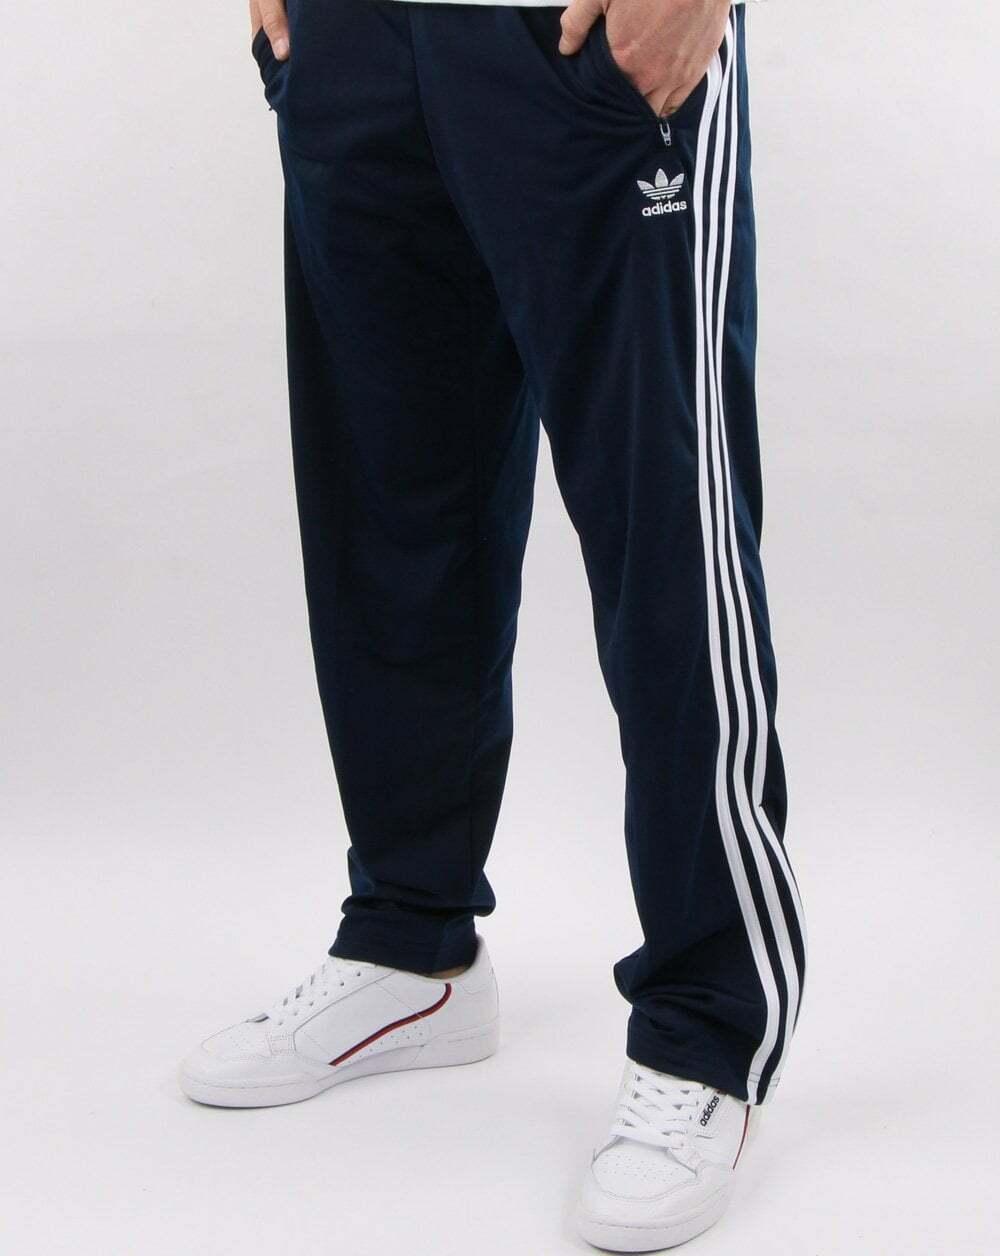 Adidas Originals Firebird Track Pants - Navy & Weiß - BNWT